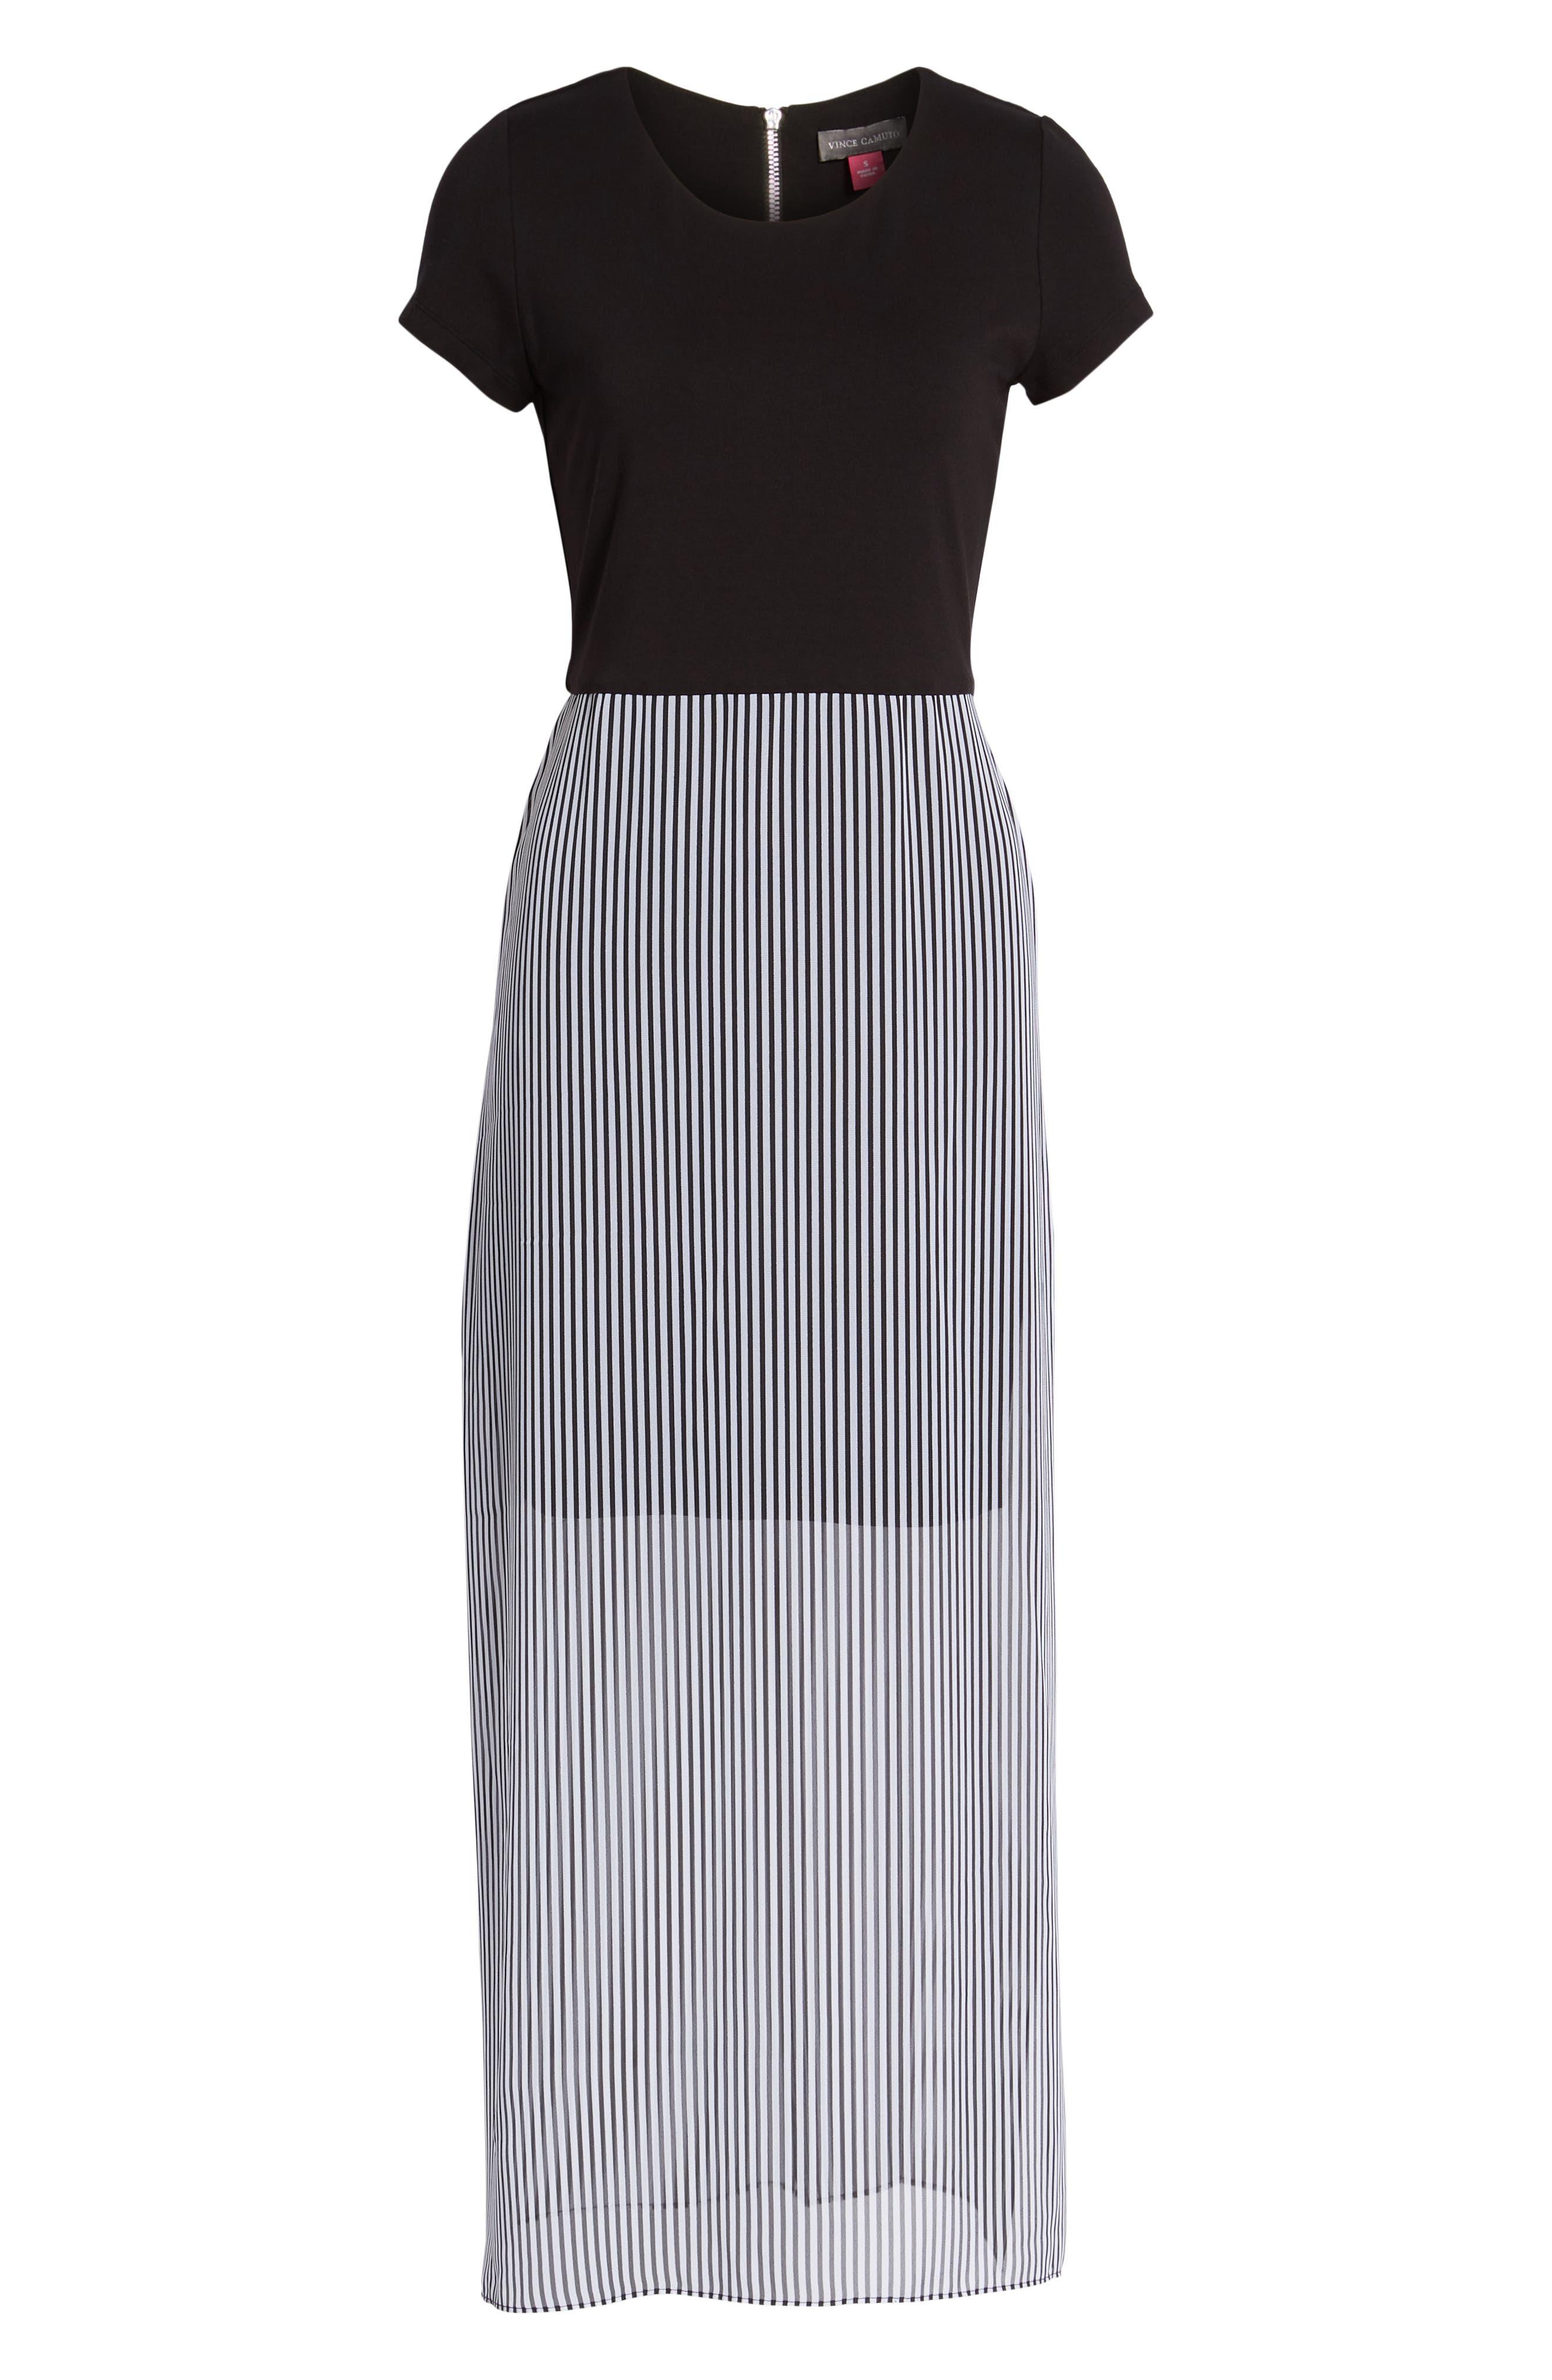 Stripe Chiffon Overlay Maxi Dress,                             Alternate thumbnail 7, color,                             RICH BLACK